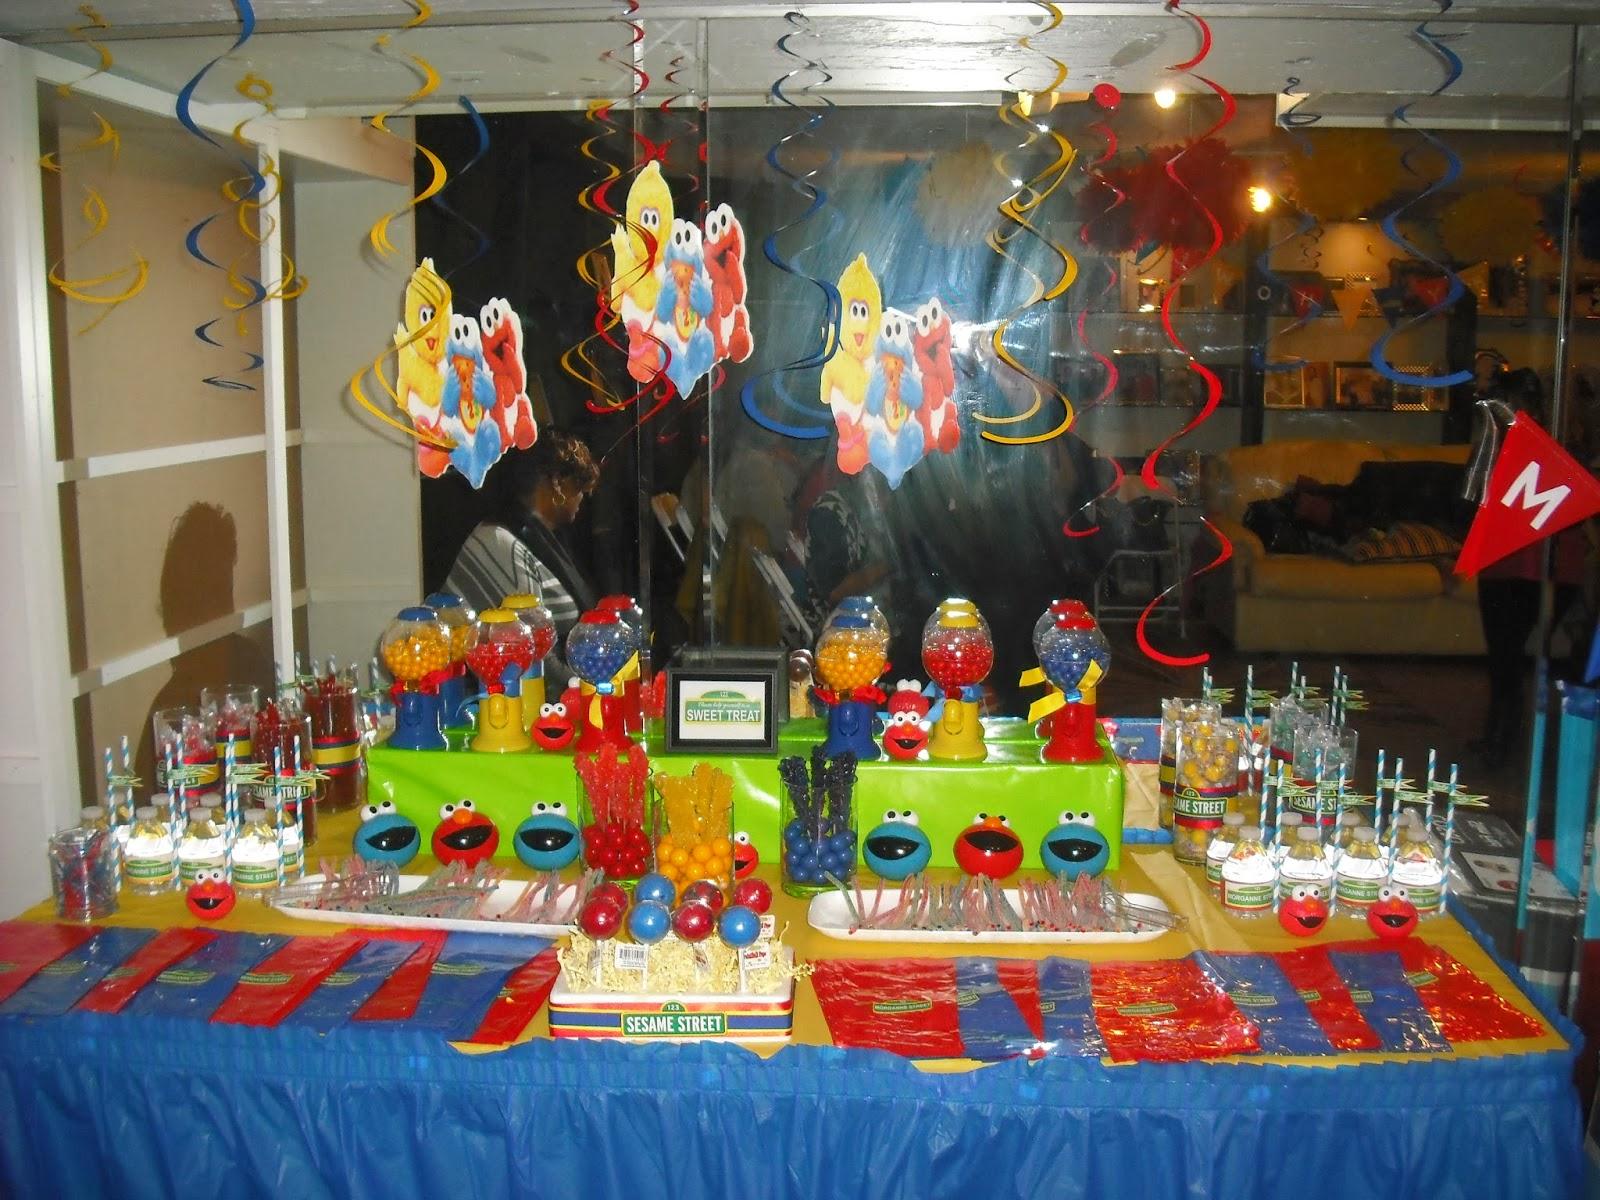 Candy Table Candy Table 2 Candy Table 3 Candy Table